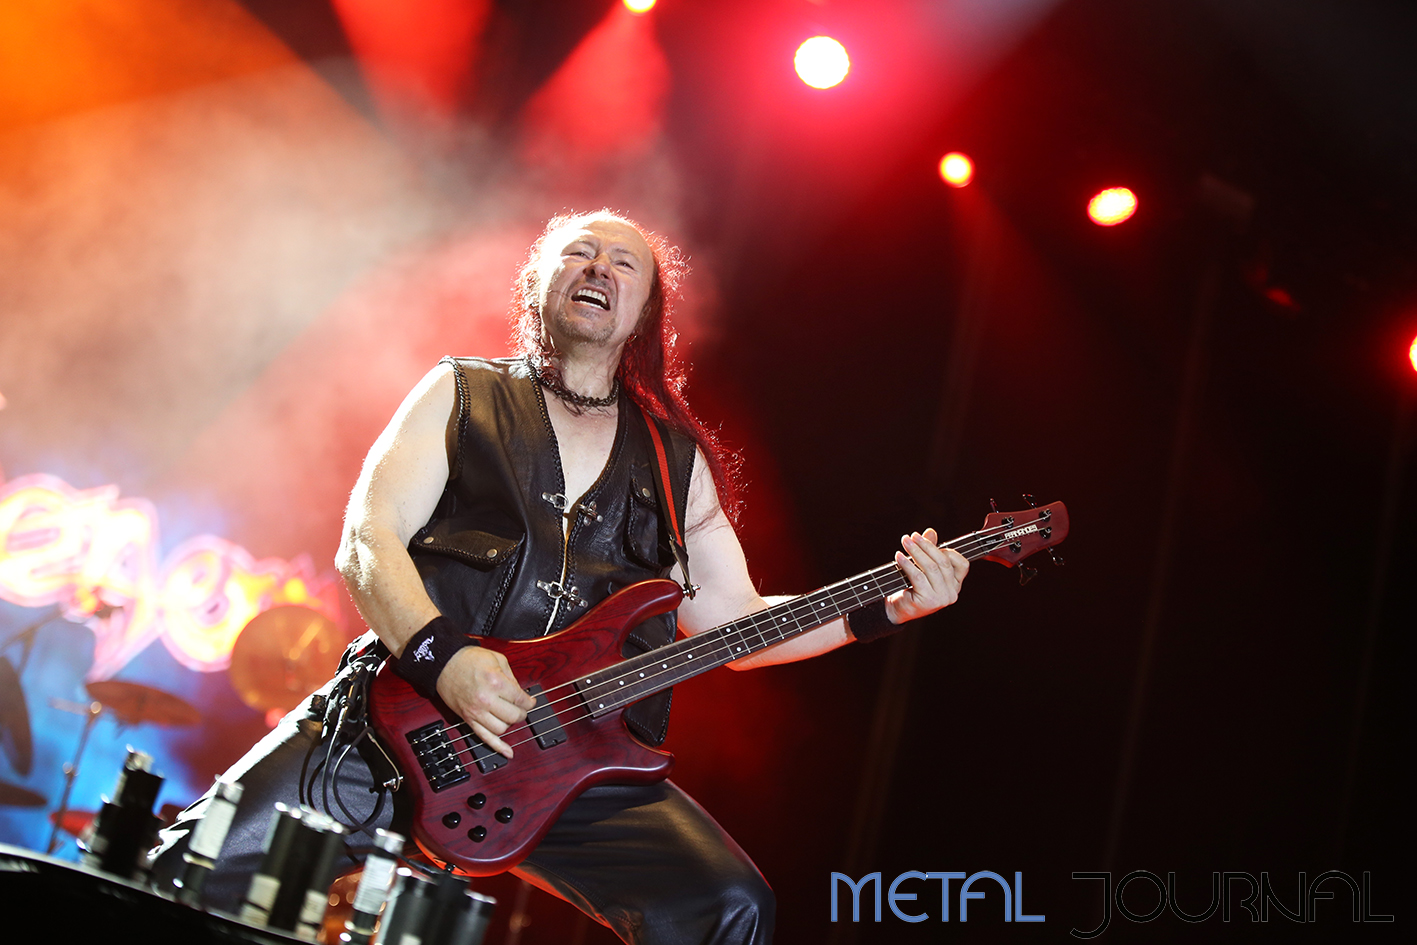 venom - metal journal rock fest barcelona 2019 pic 6